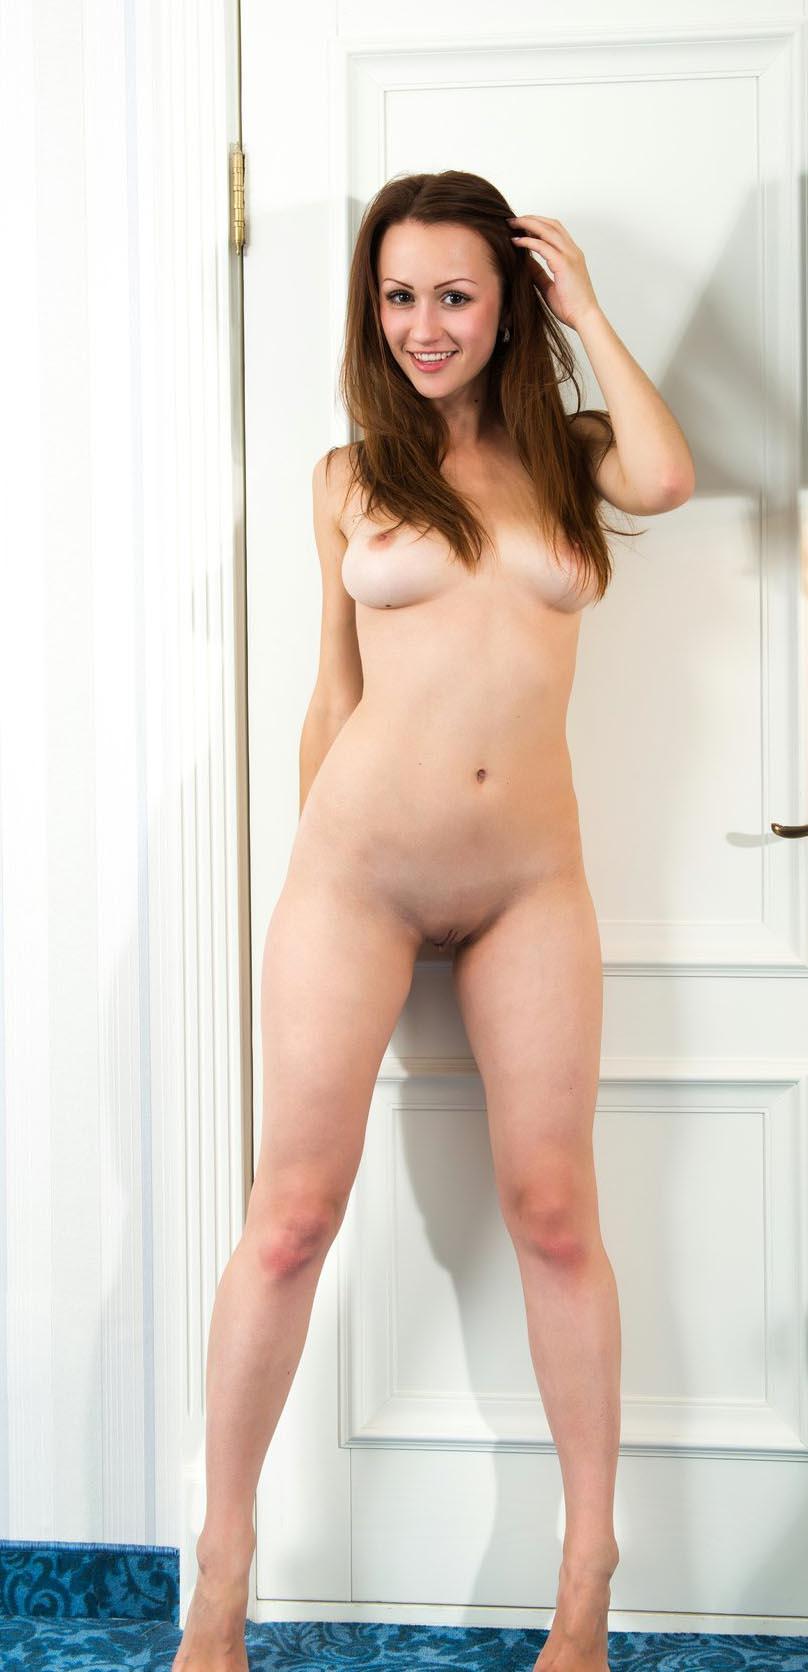 dirty cute naked girls